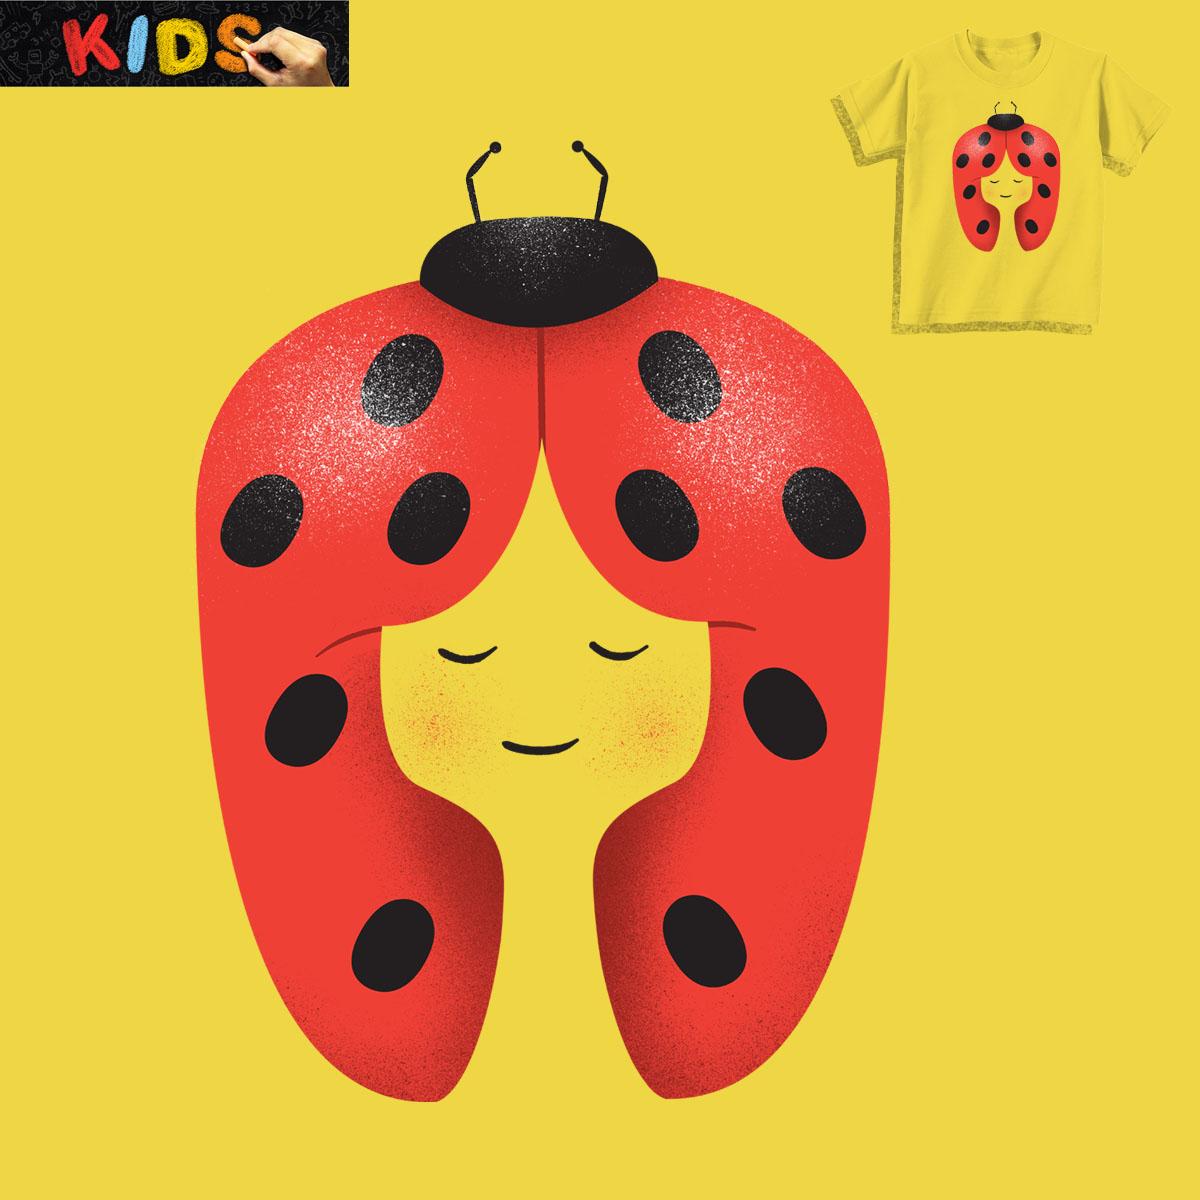 Ladybug by Wharton on Threadless